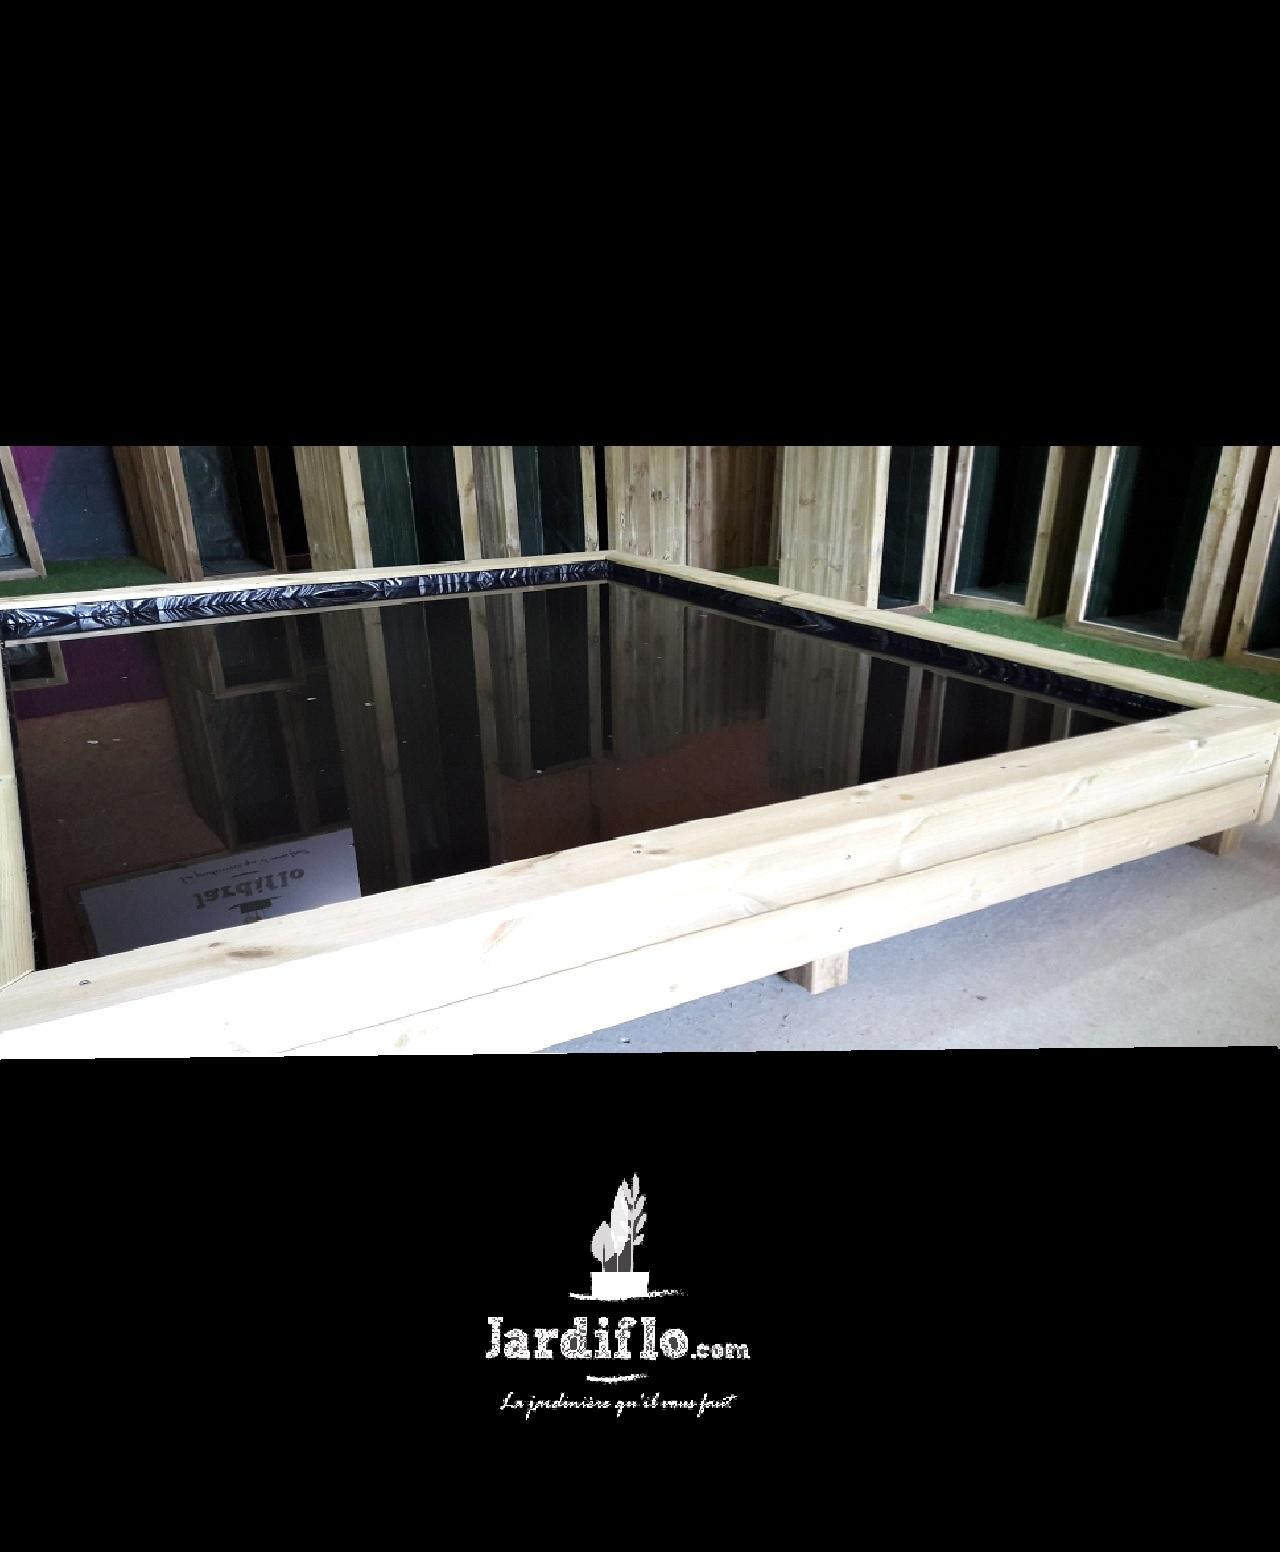 bassin d ornement rectangulaire maison design. Black Bedroom Furniture Sets. Home Design Ideas